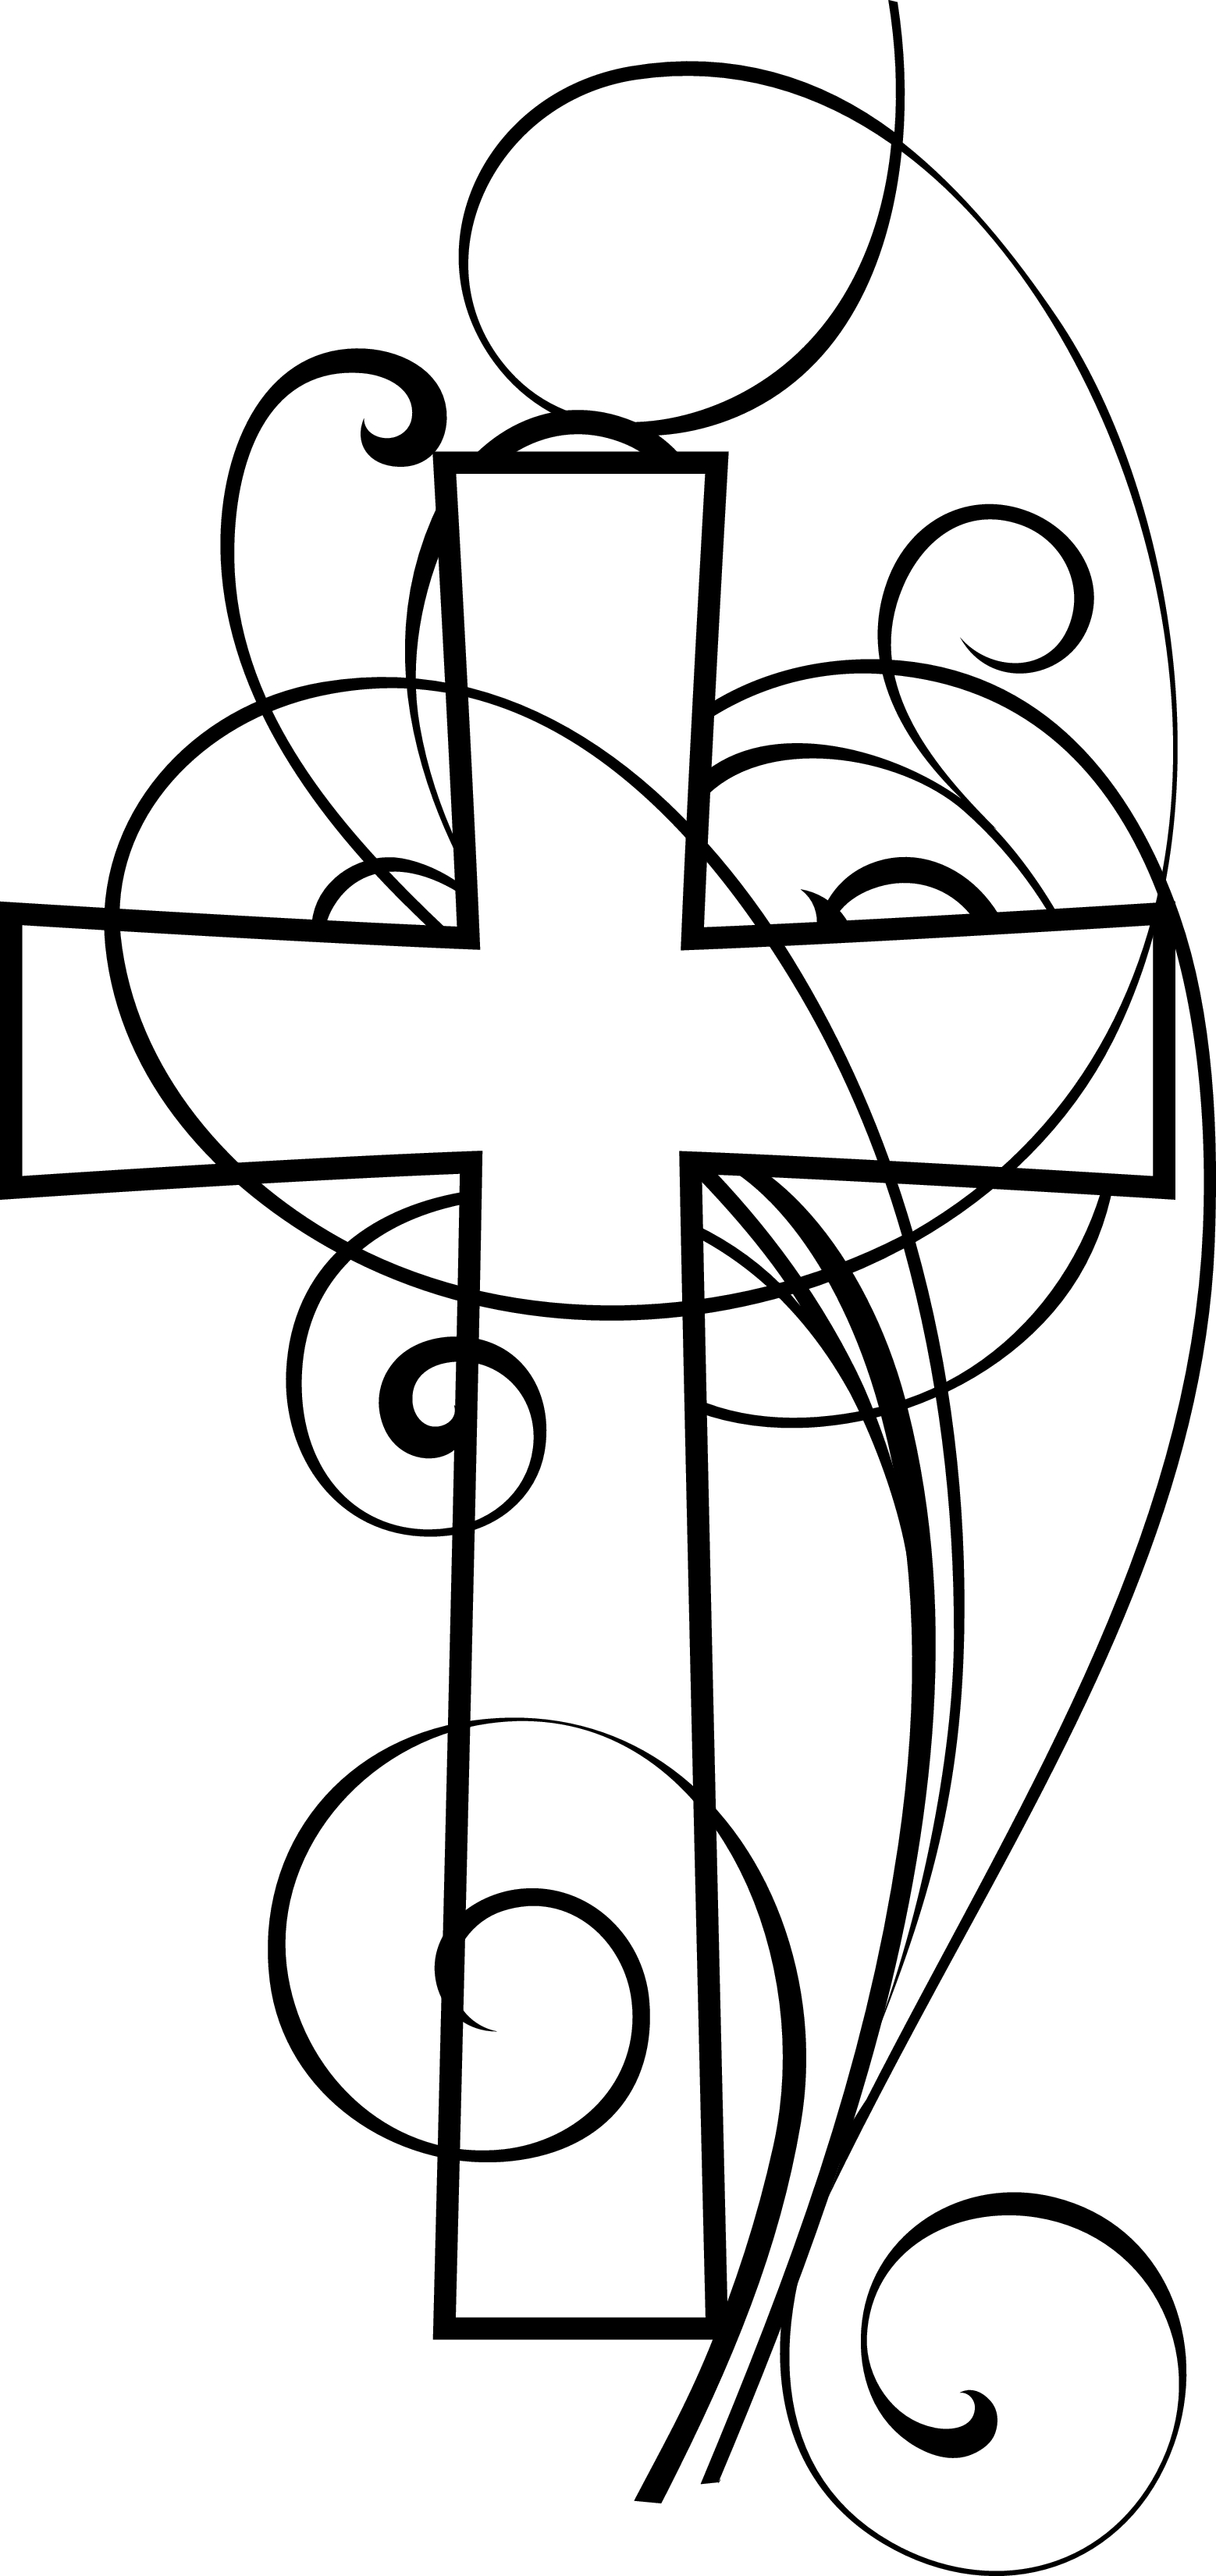 Black Religious Art Pictures